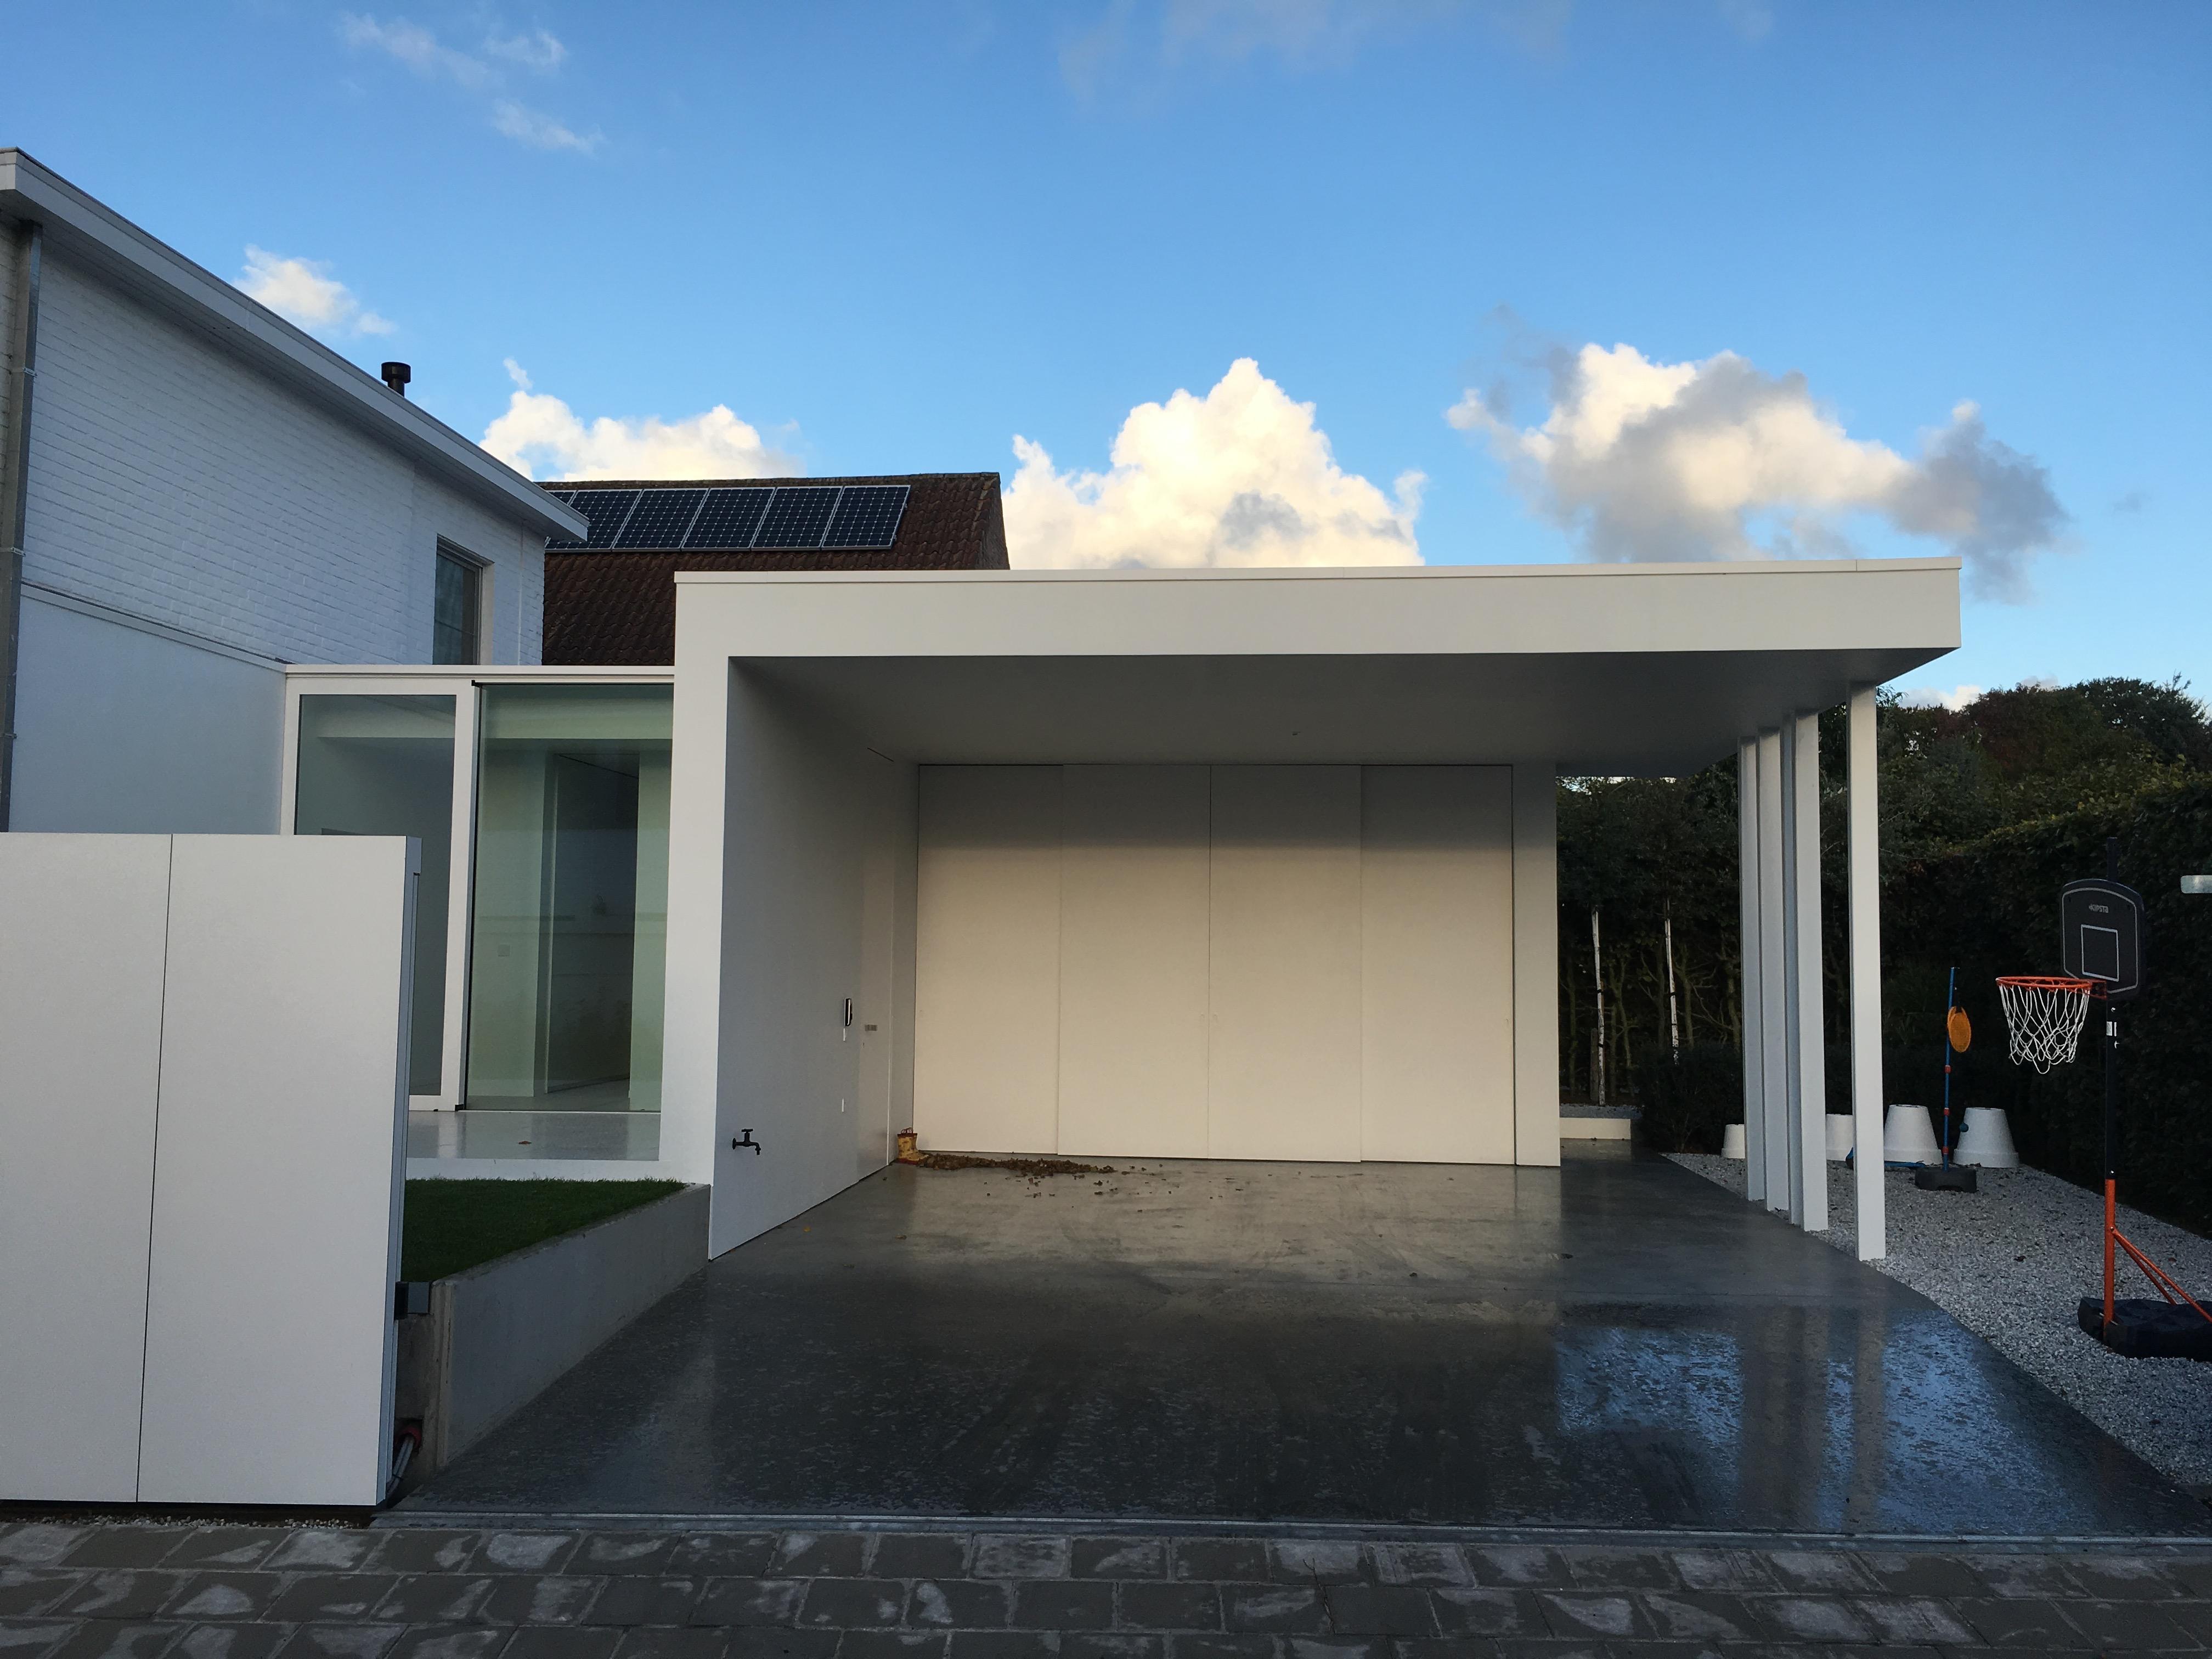 Schilderwerken West-Vlaanderen | Parket West-Vlaanderen | Schrijnwerken West-Vlaanderen